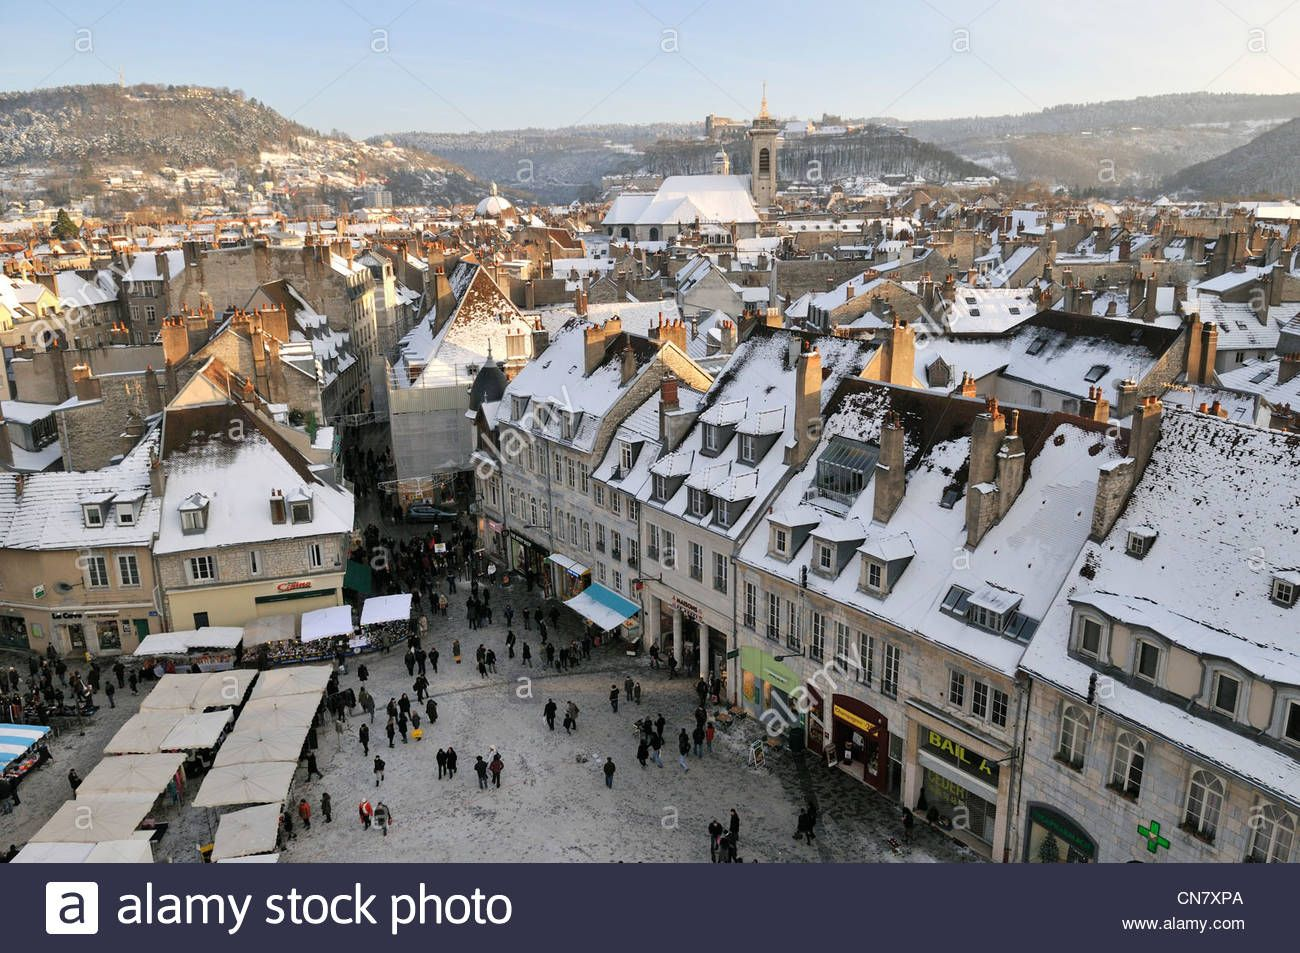 France, Doubs, Besancon, Revolution Square, Christmas Market, City Stock Photo, Royalty Free Image: 47503186 - Alamy